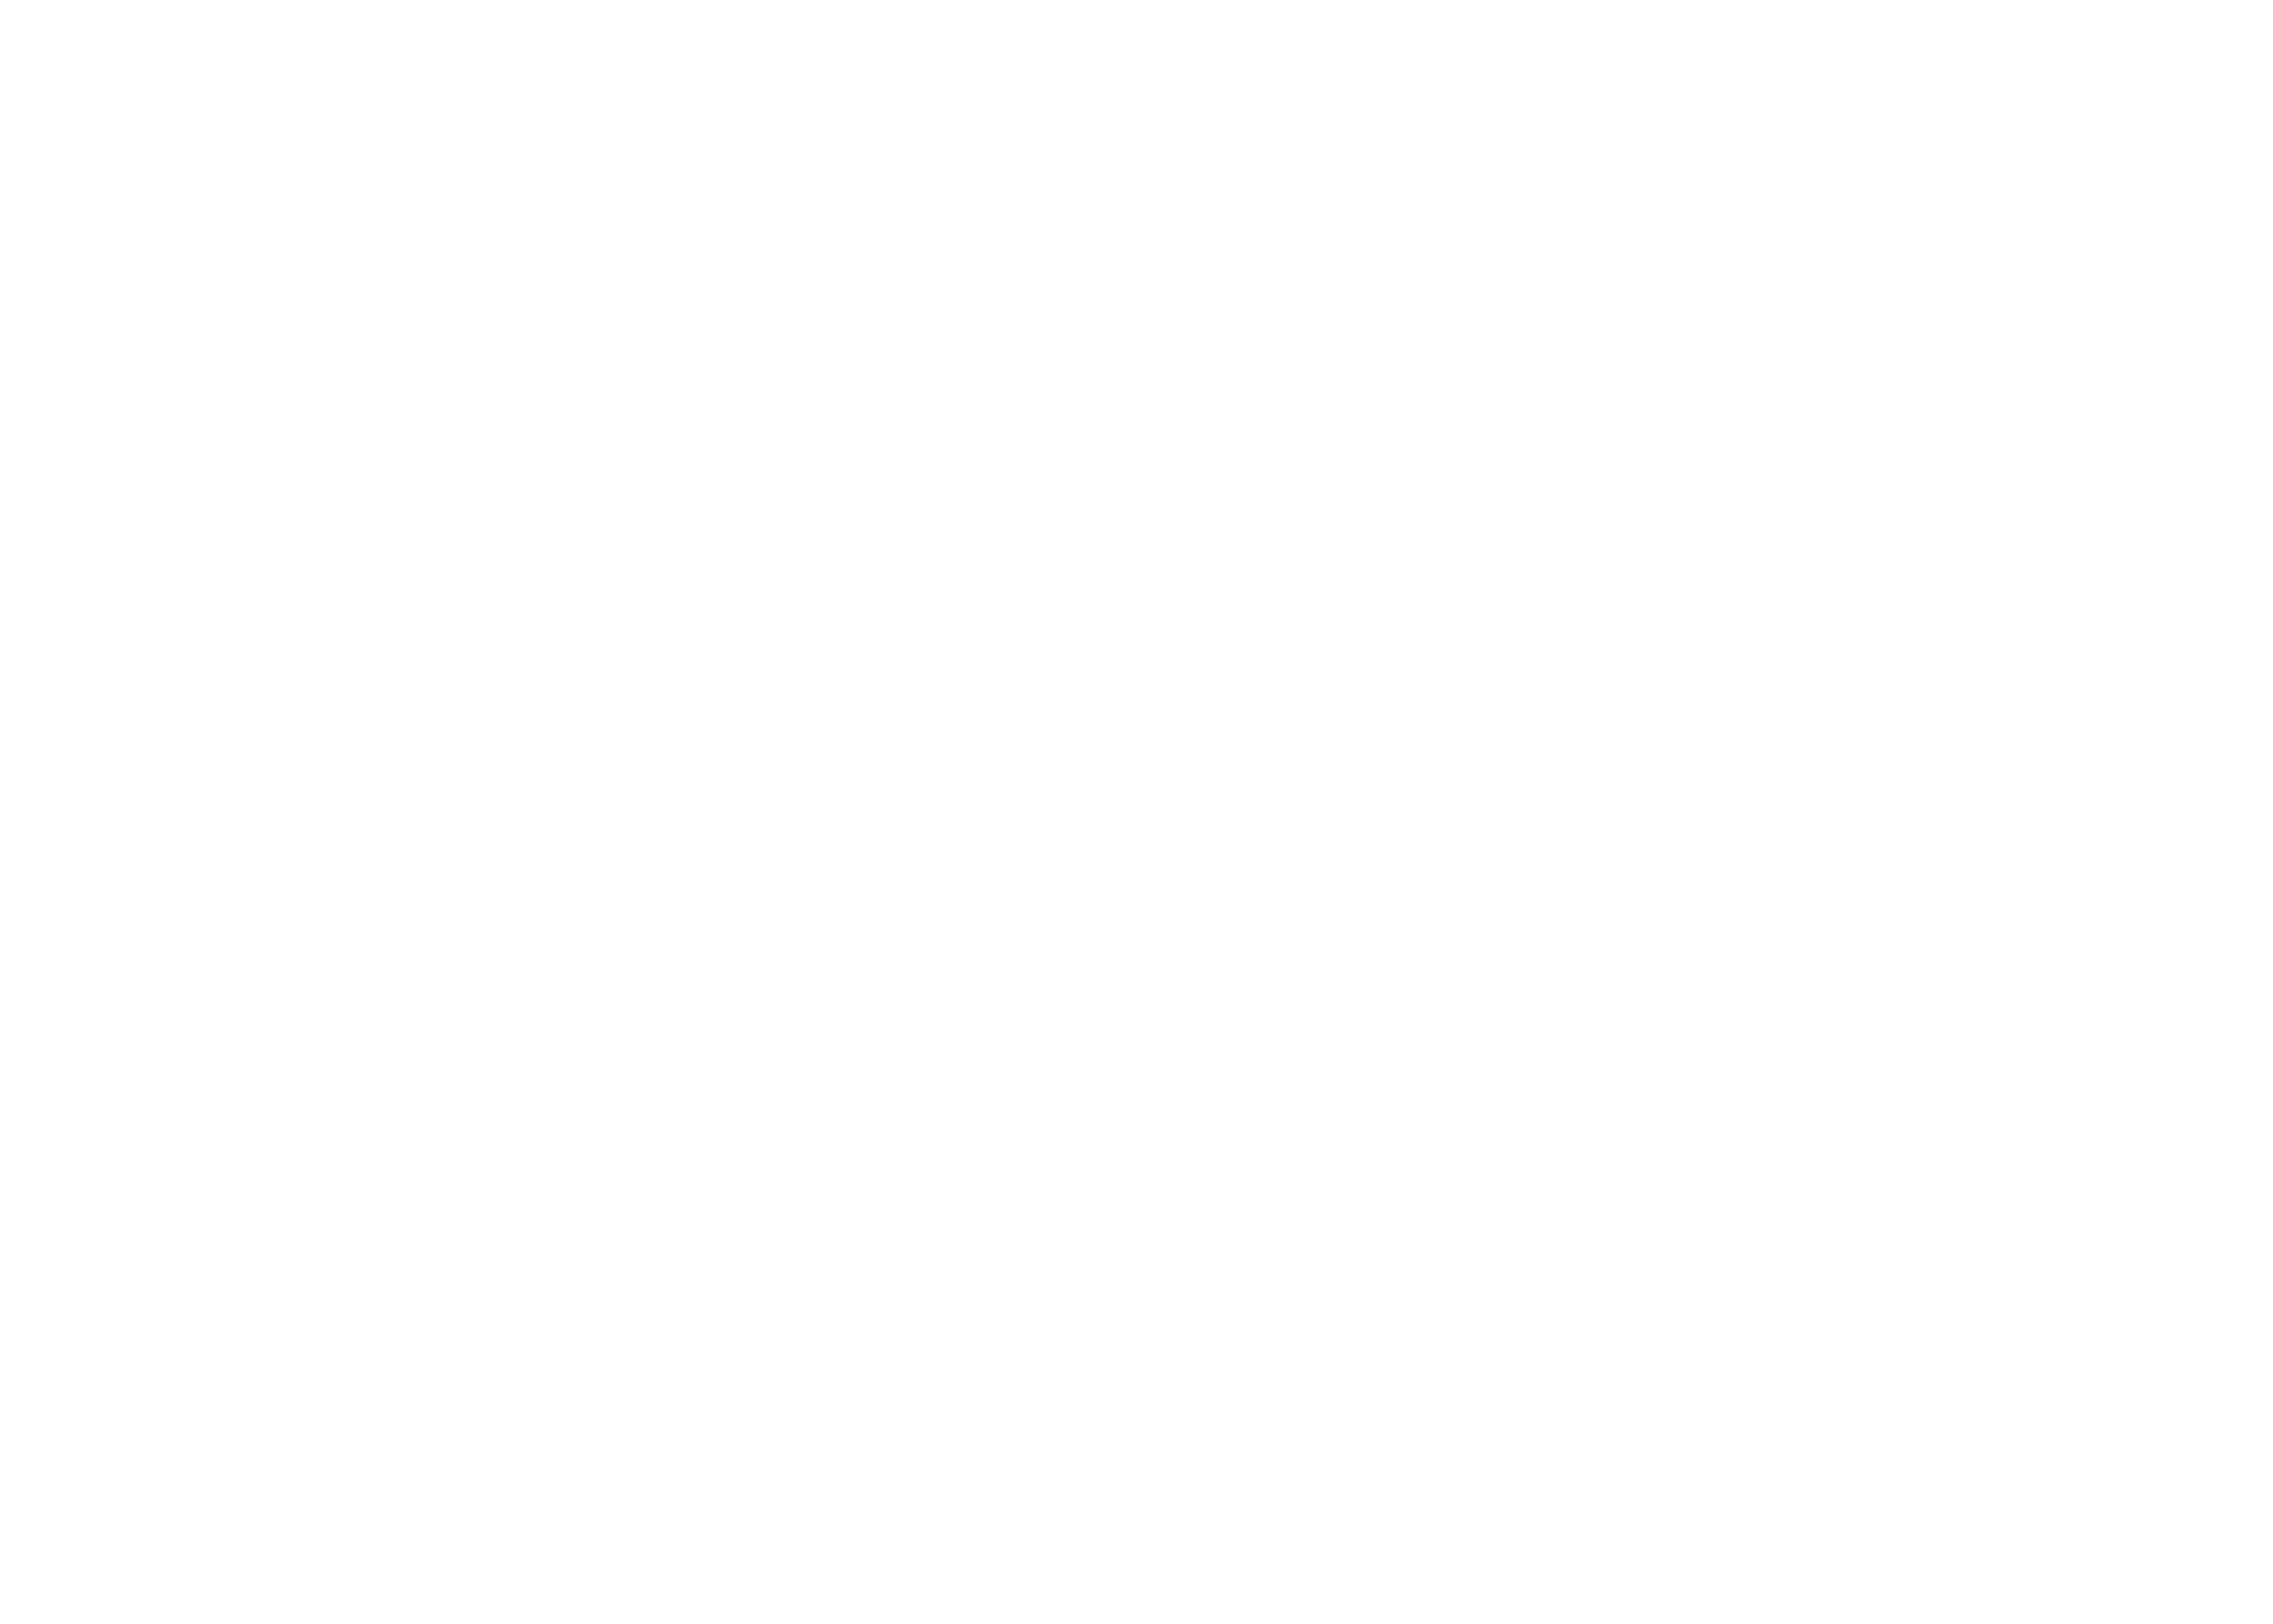 Updated AIPIP Logo